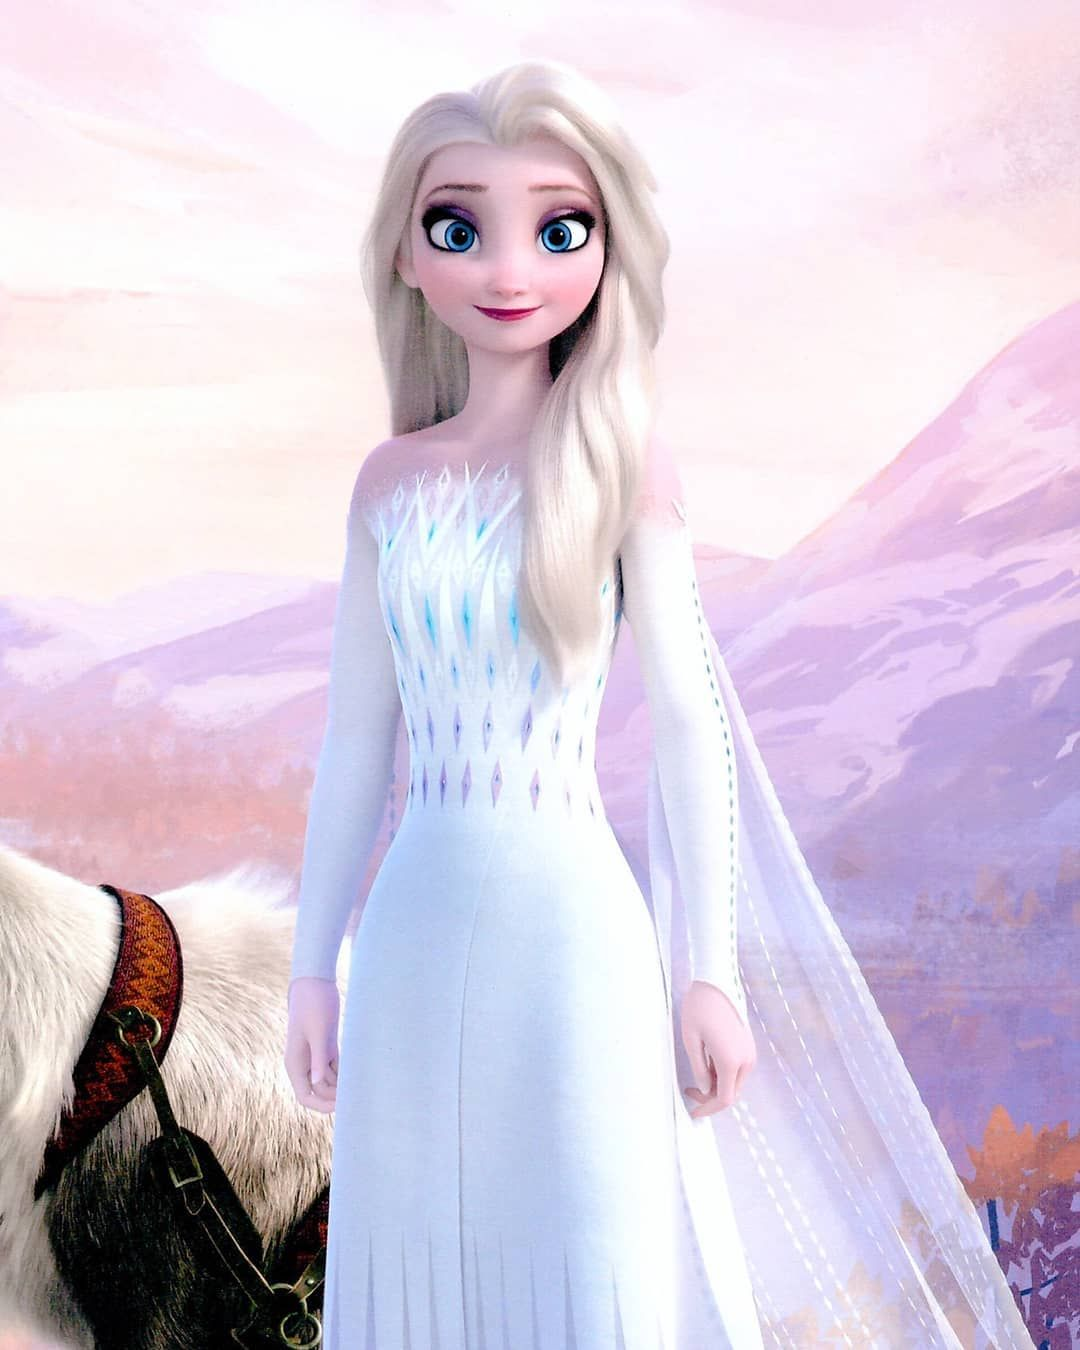 824 Otmetok Nravitsya 9 Kommentariev Icy Snowflake Miss Icy Snowflake V Instagram She S An Angel Froz Ragazze Disney Principesse Disney Principesse